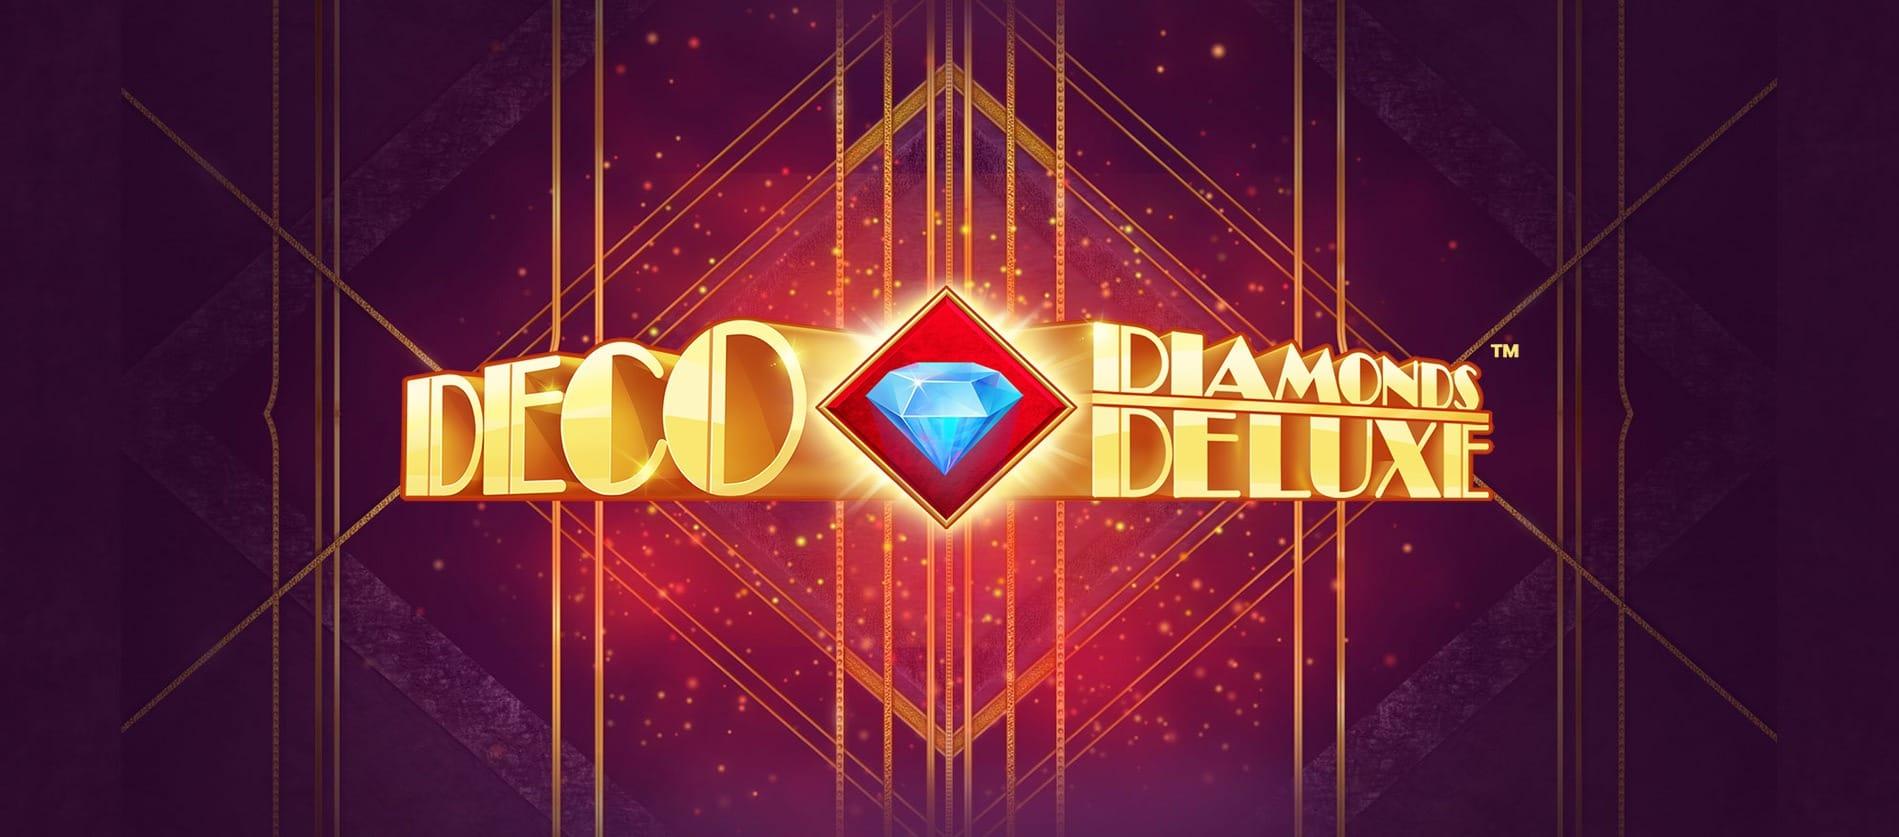 Deco Diamonds Deluxe Slot Banner